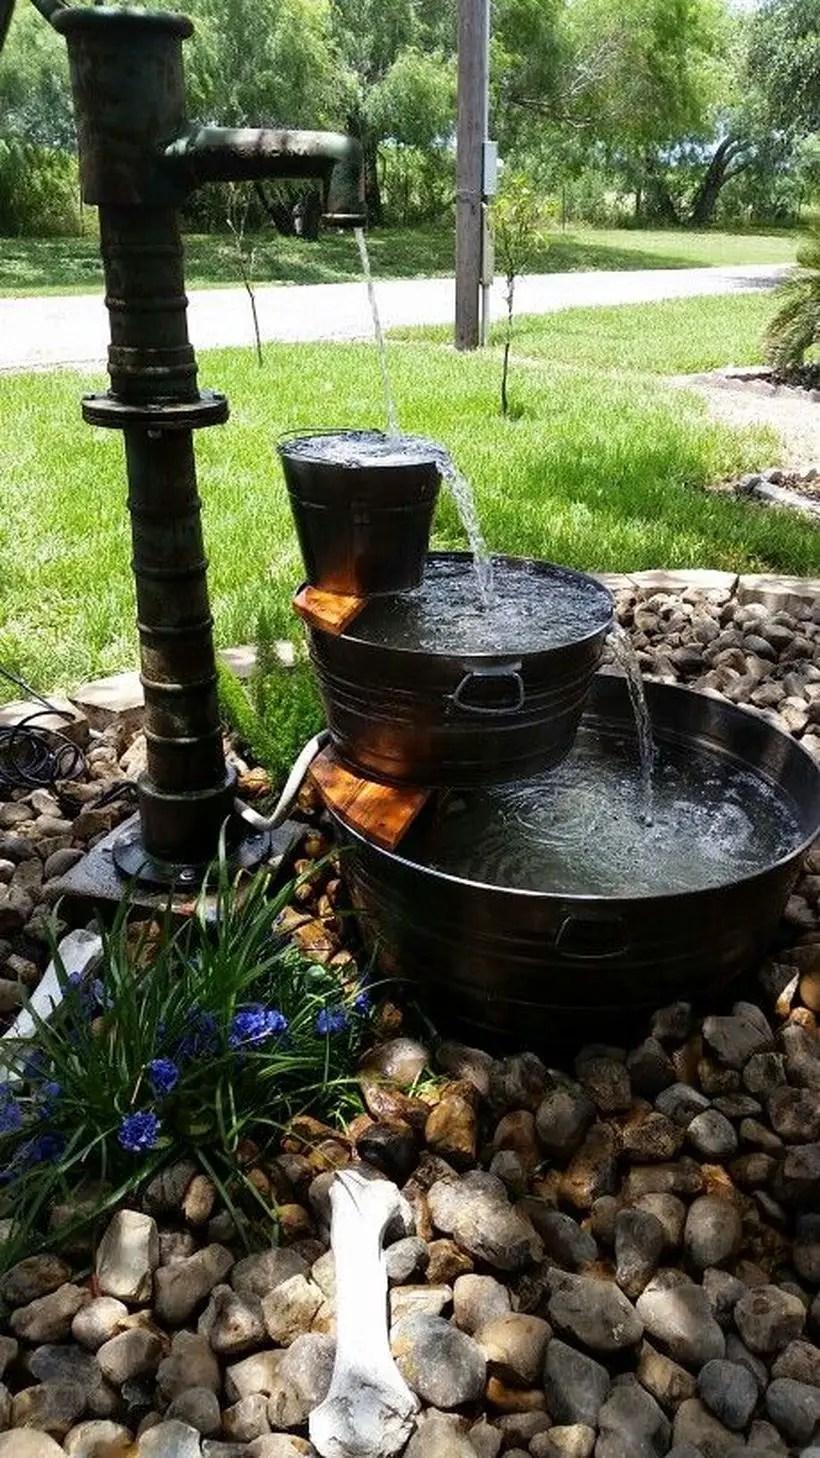 Galvanized-water-trough-fountain-